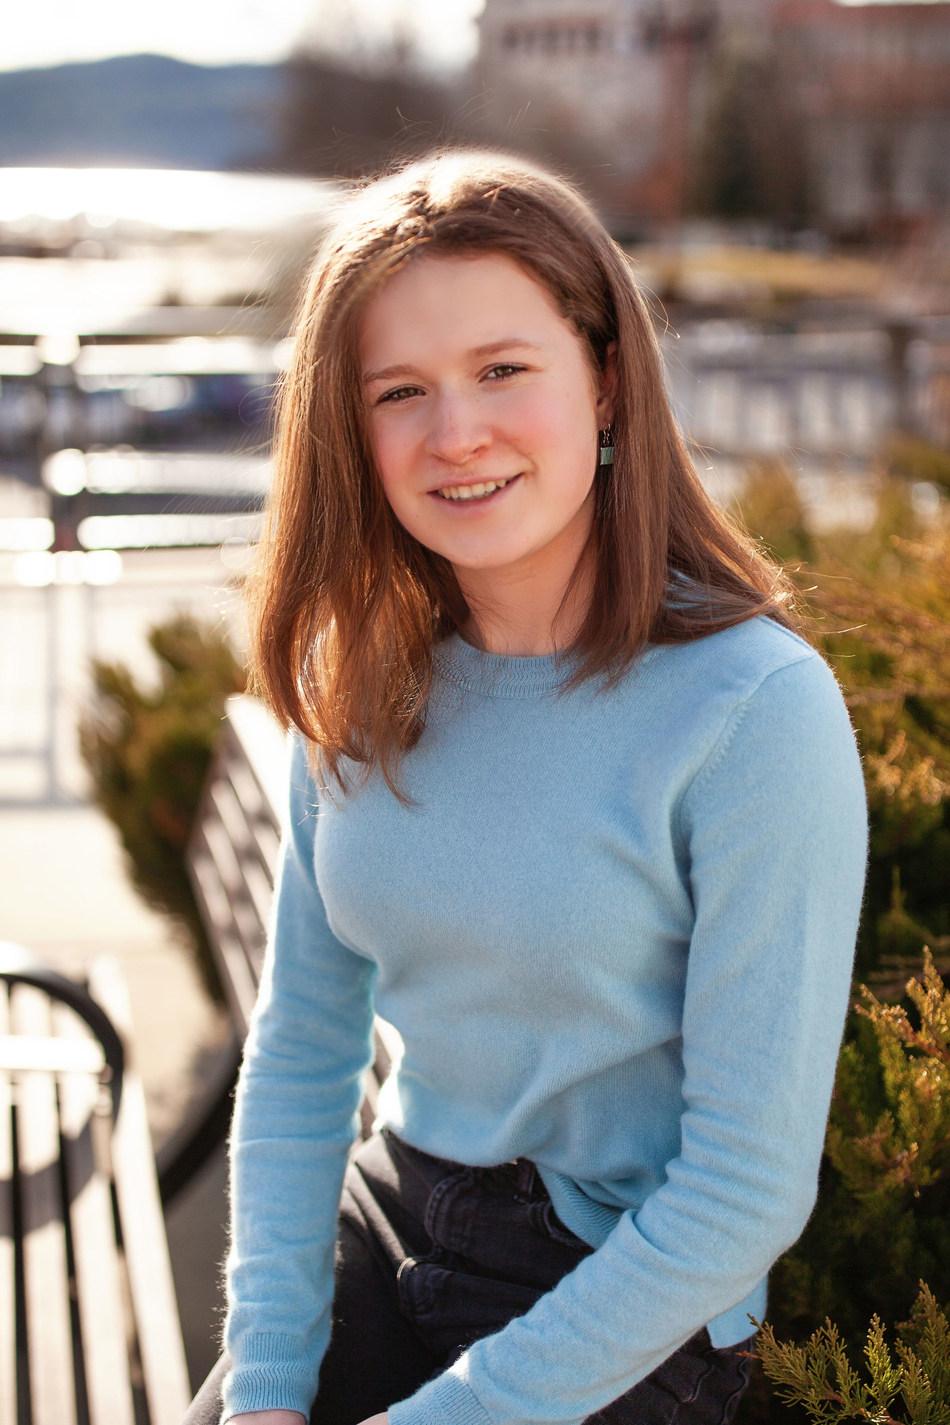 Lilian Smith (PRNewsfoto/Prudential Financial, Inc.)